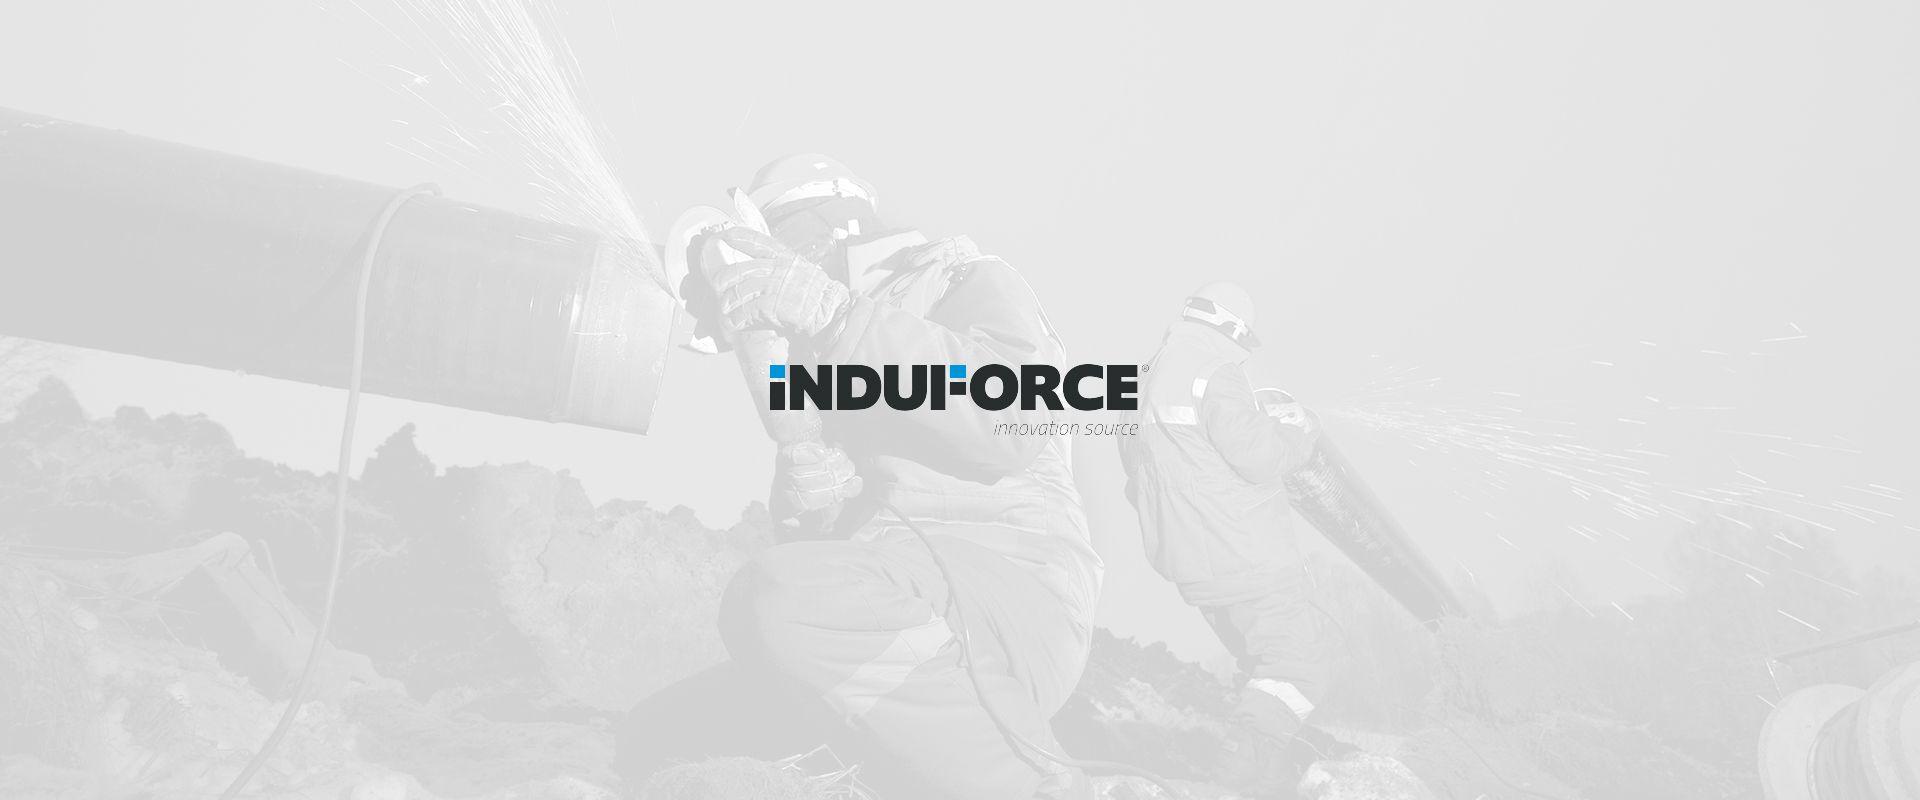 Induforce